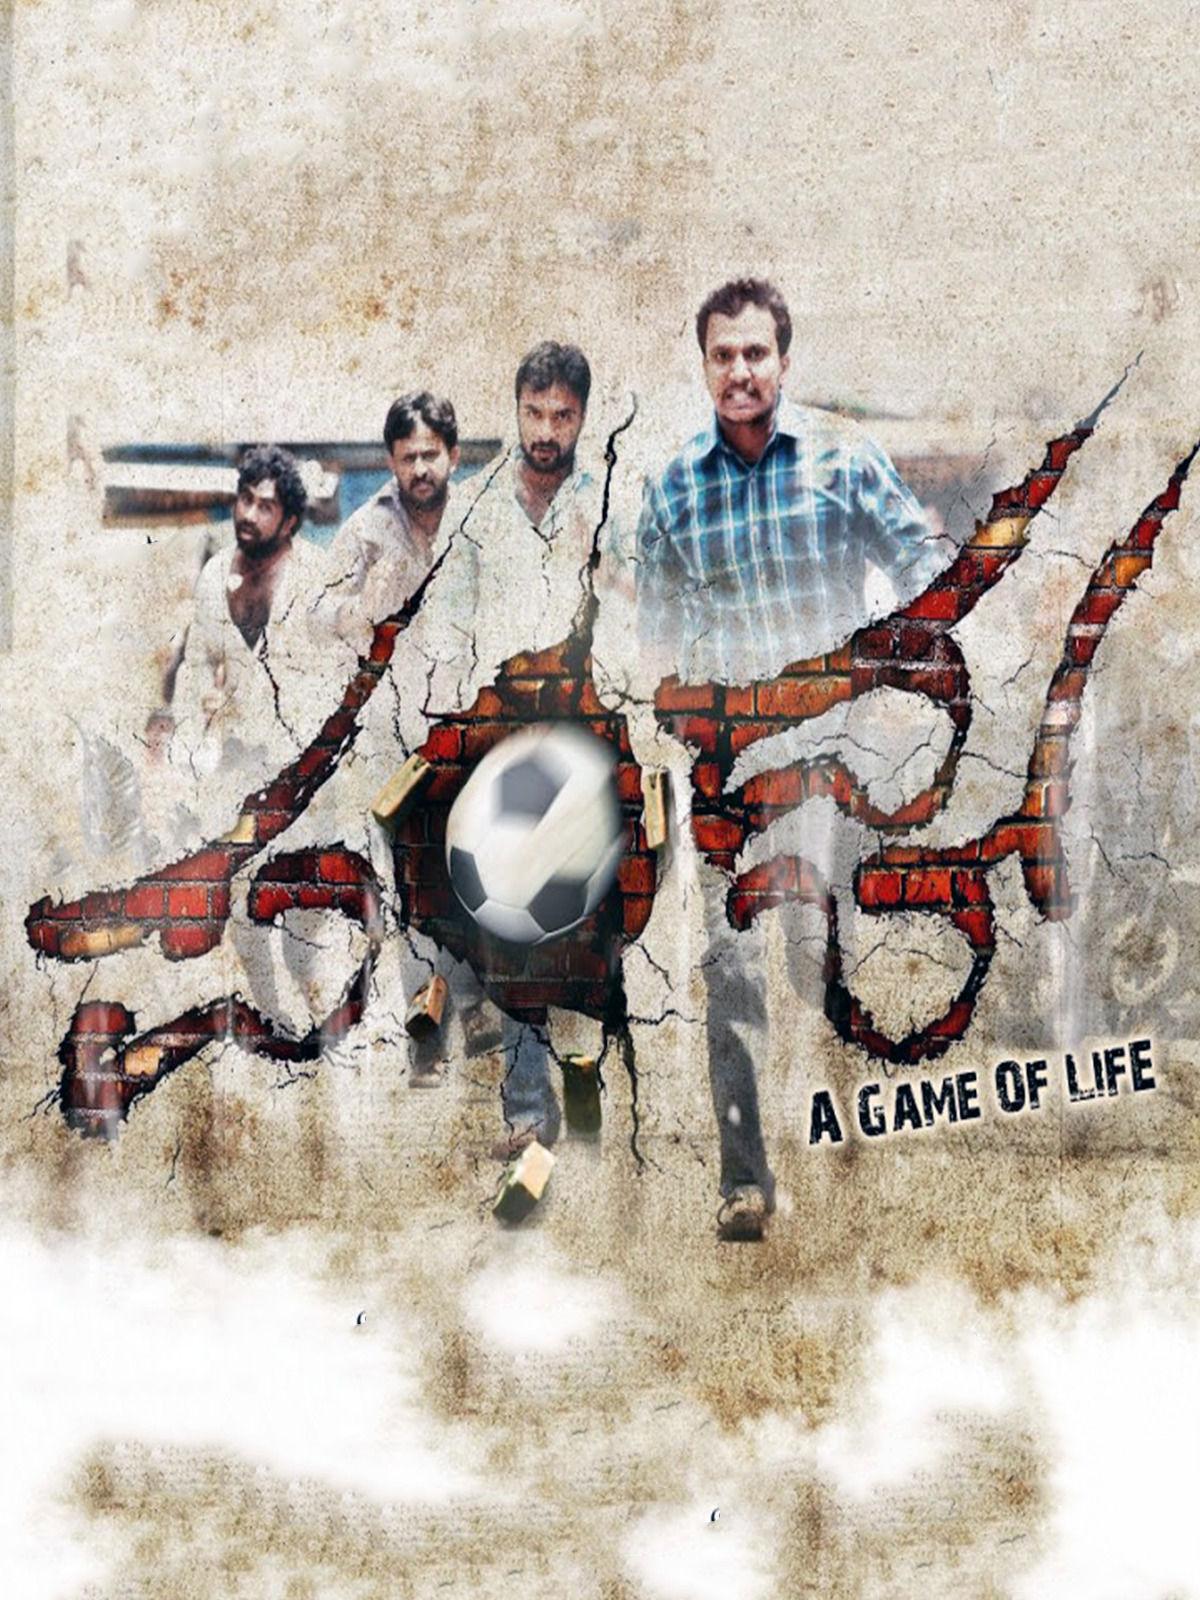 Devu Best Movies, TV Shows and Web Series List